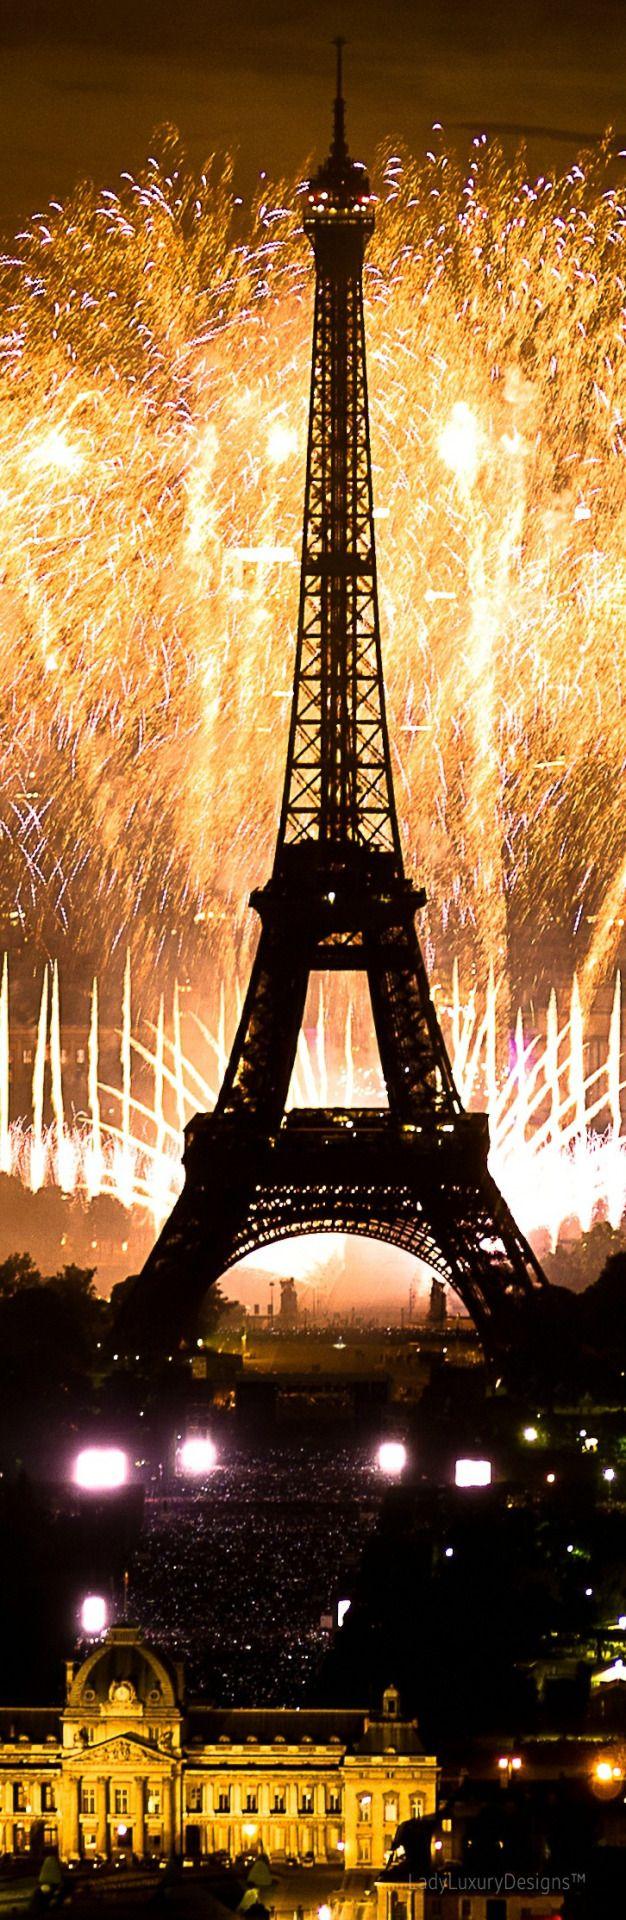 Eiffel Tower bastille day - LadyLuxuryDesigns